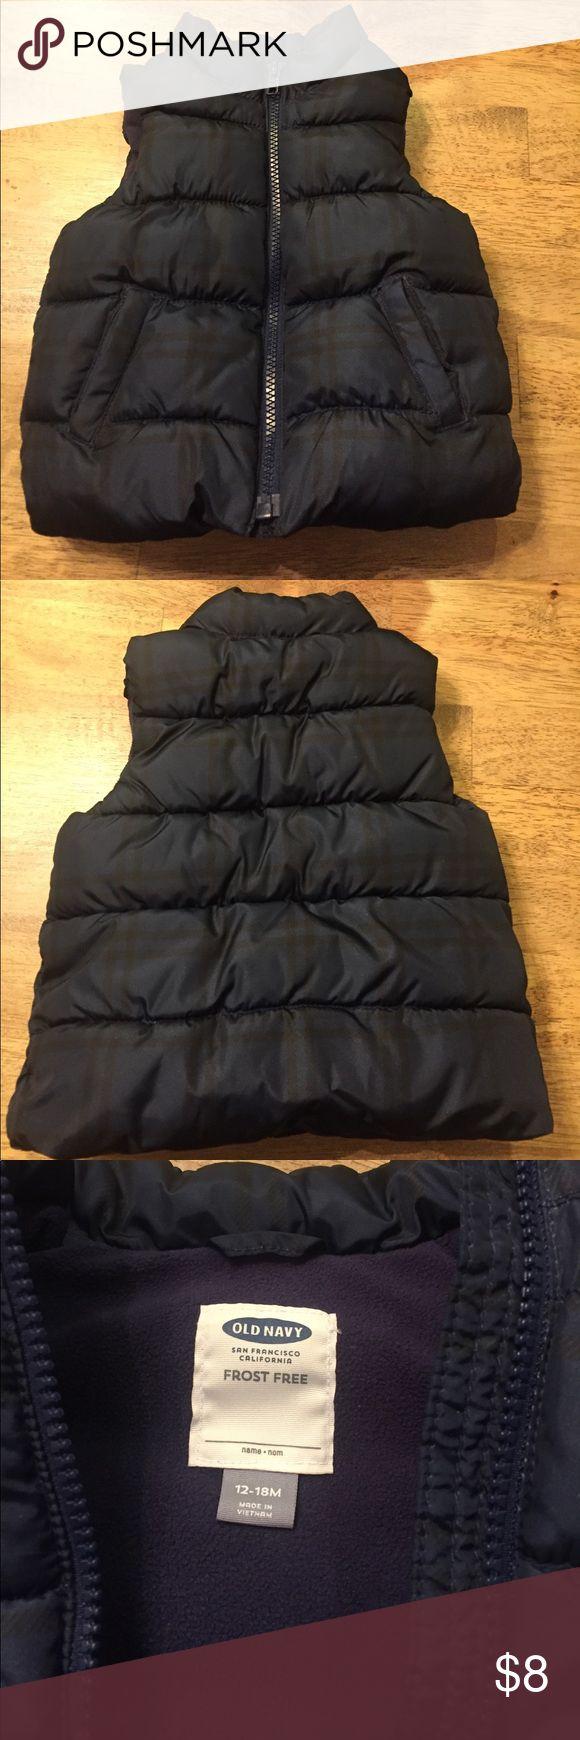 Old Navy Vest Old Navy Frost Free Vest. Excellent condition! Old Navy Jackets & Coats Vests